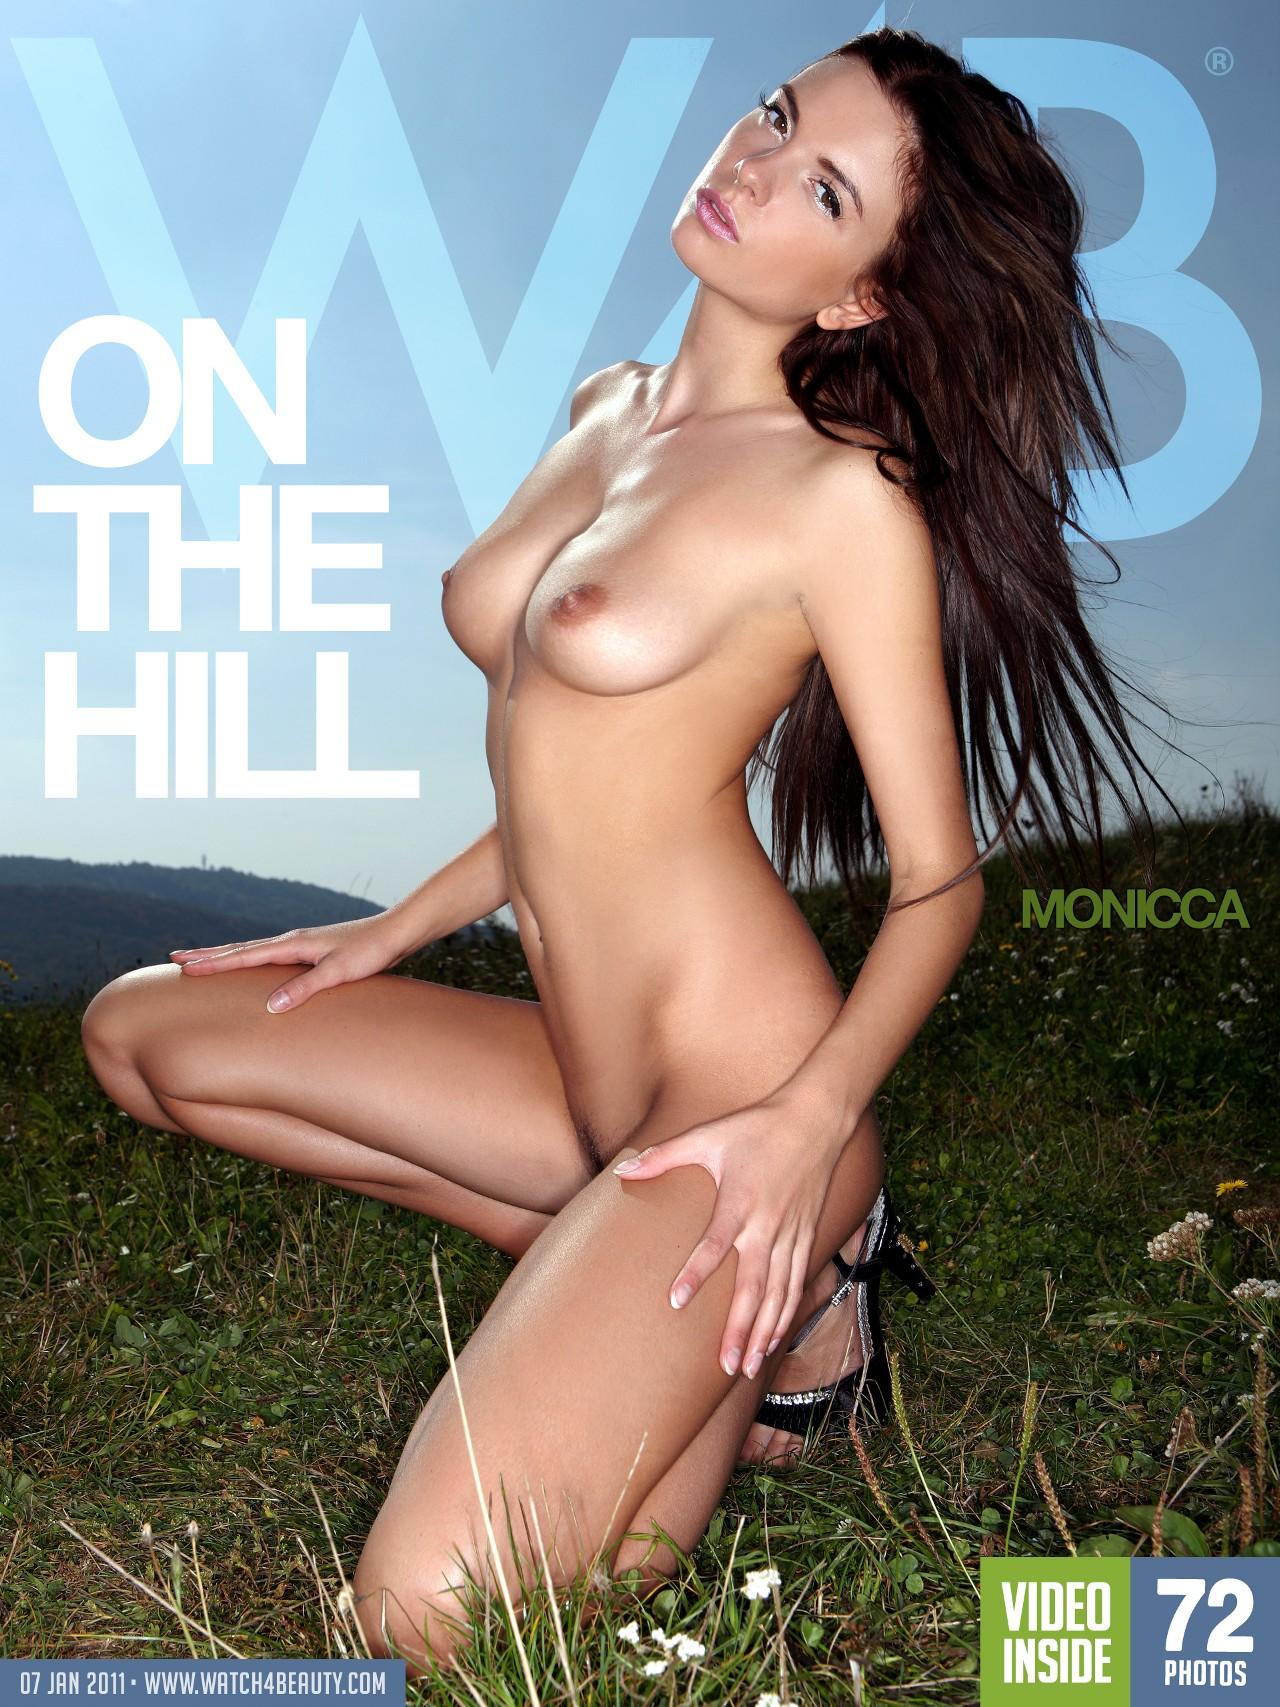 Monicca: On the hill